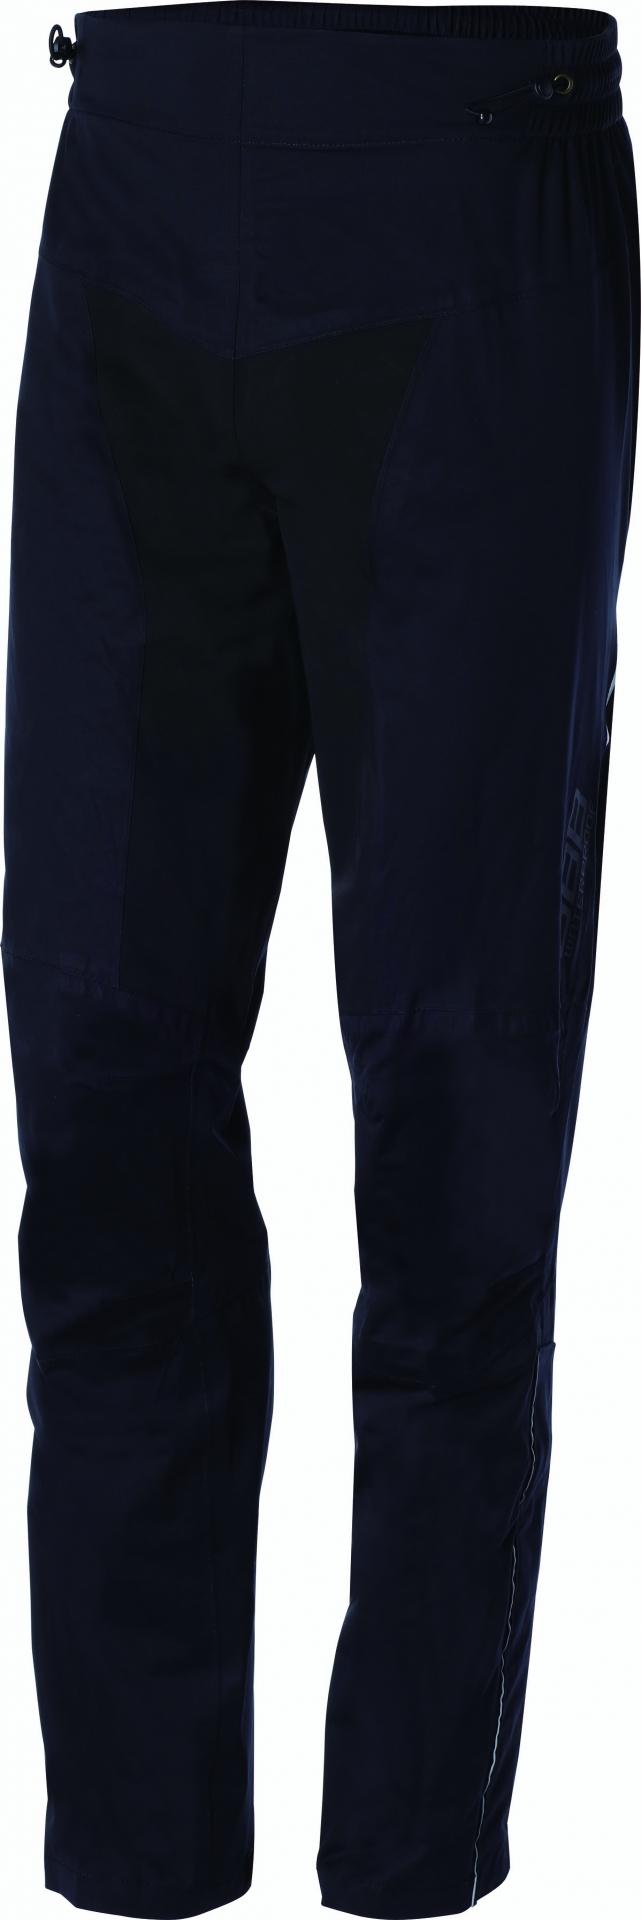 Pantalon léger étanche BBB DeltaShield Noir BBW-270 - S